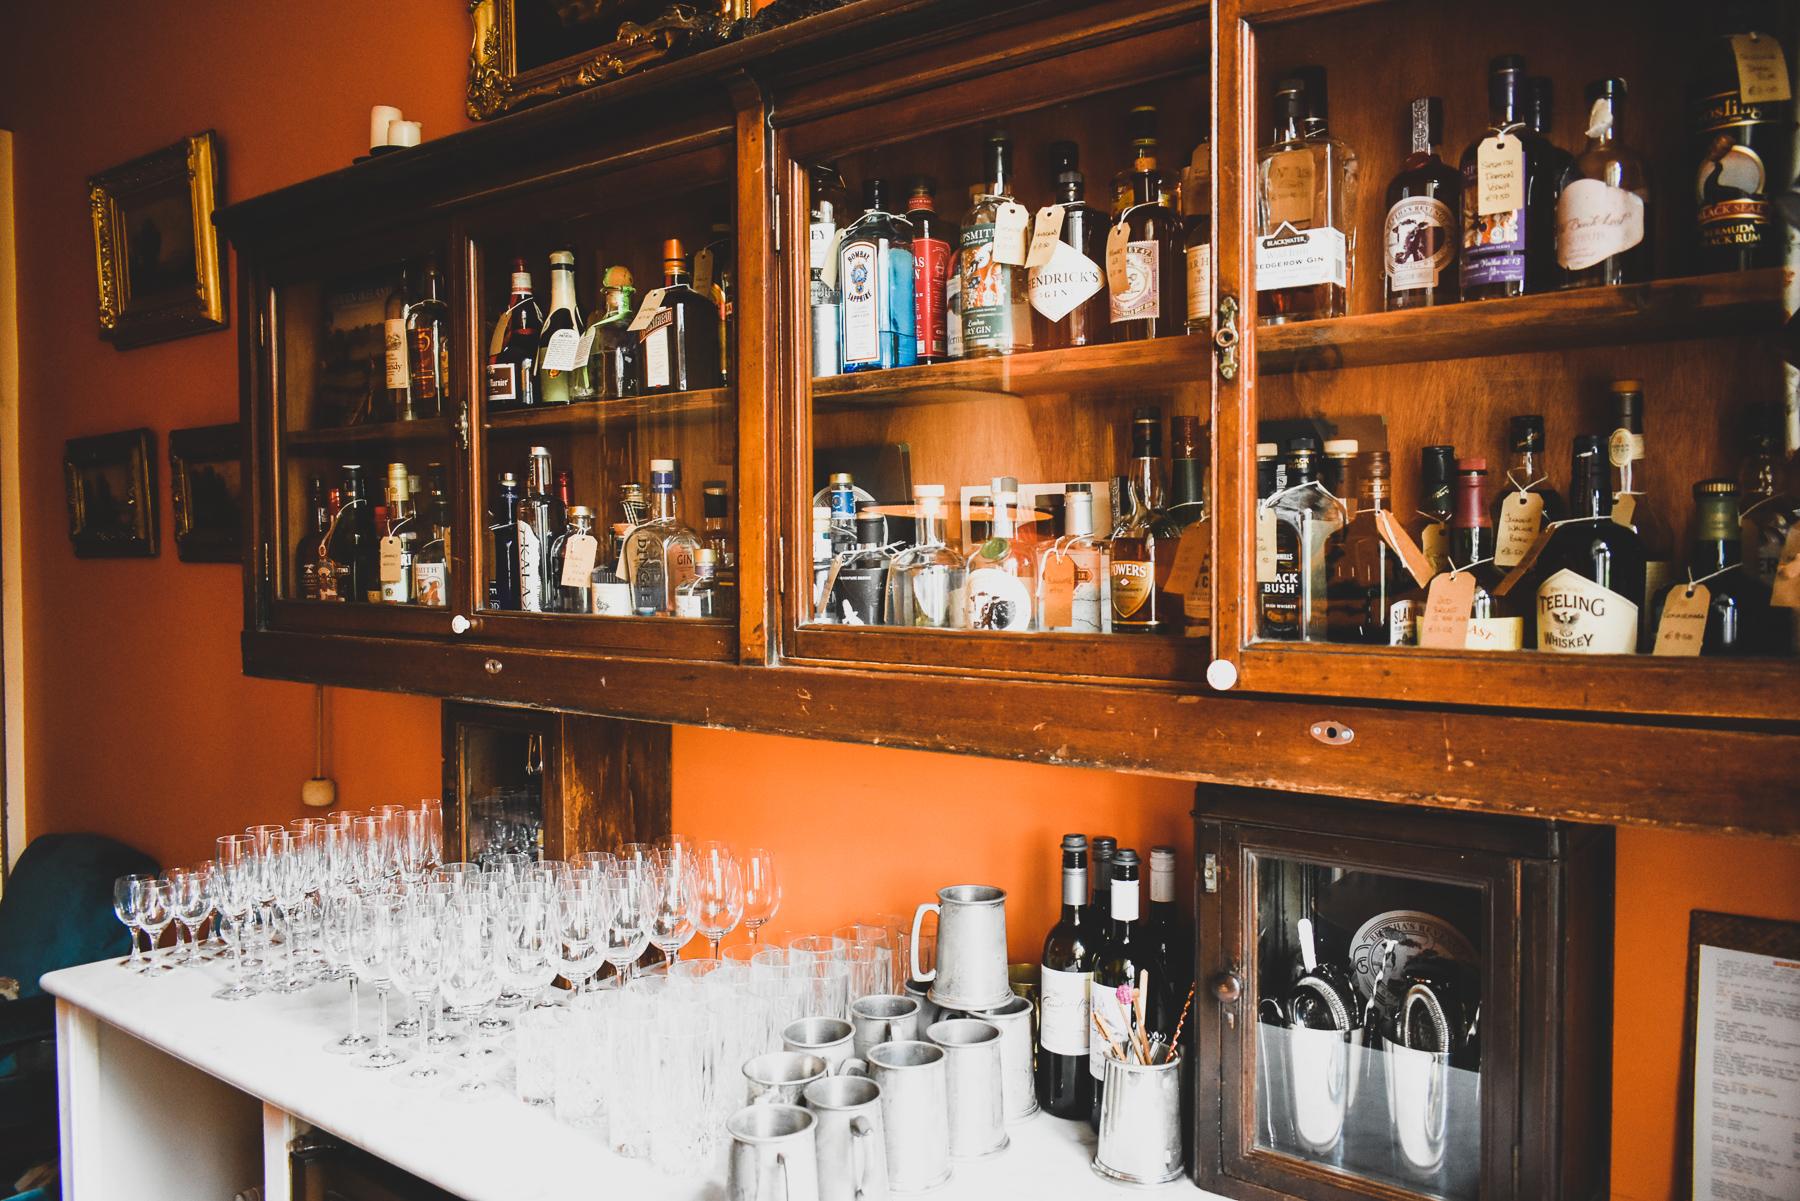 Antony Jackson Berthas Revenge, Ballyvolane Bertha's Revenge gin, Ballyvolane House Cork, Berthas Revenge Cork, Berthas Revenge Ireland, boutique wedding venue ireland, irish food blogger, Irish gin producer, Irish premium gin, Justin Green Ballyvolane, Justin Green Berthas Revenge, cork distillery, gin distillery ireland, whey gin, hidden ireland guesthouse cork, Jenny green, Castlelyons Cork, Ballyvolane, glamping cork, glamping Ireland